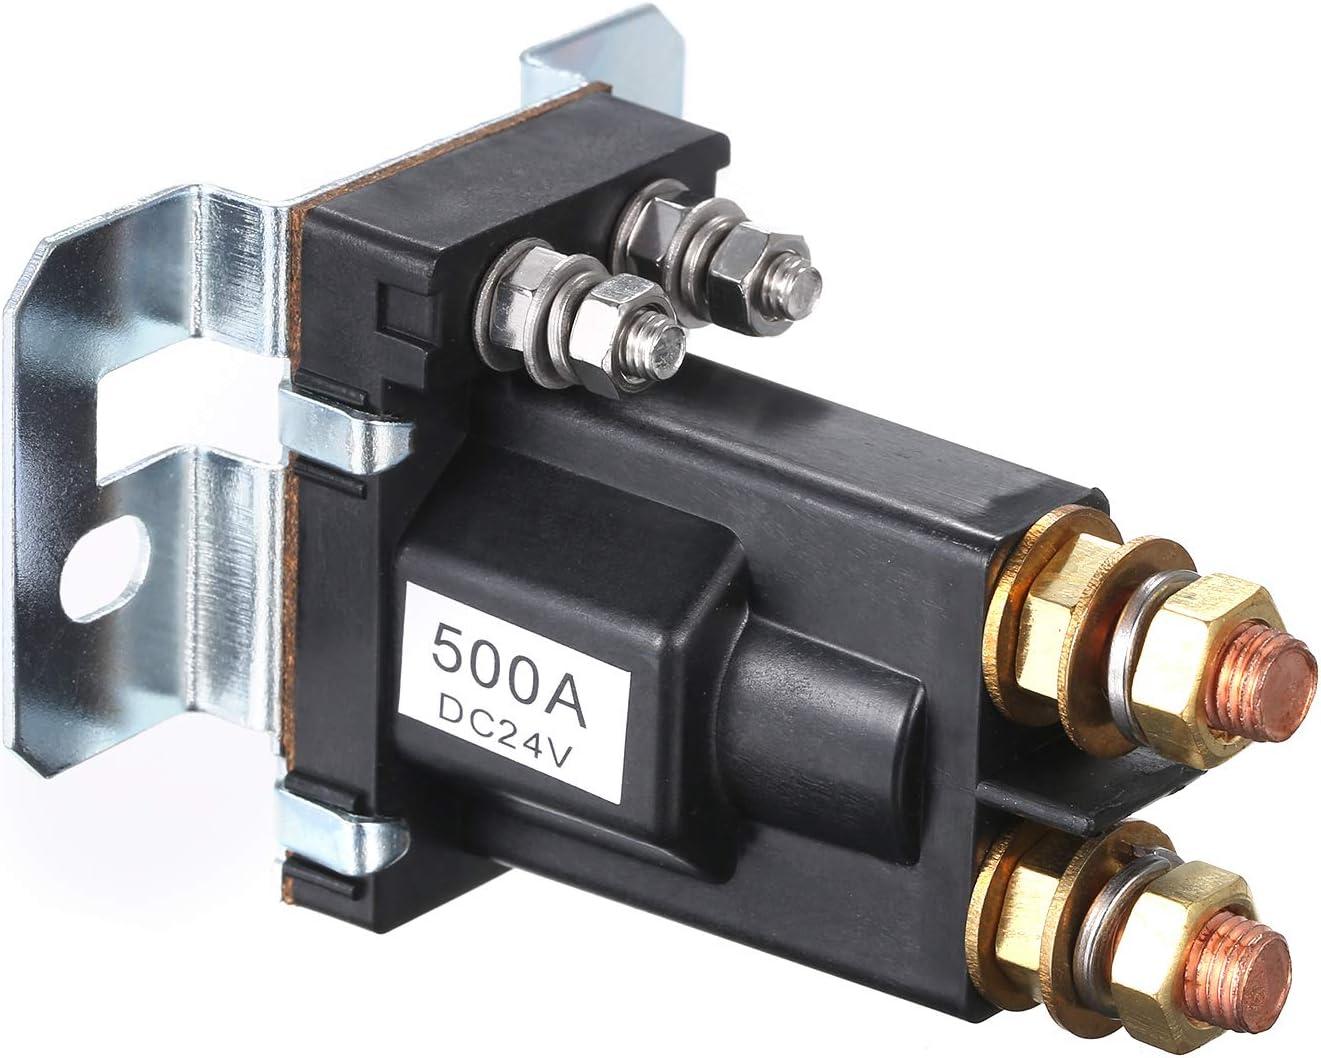 DC Relay,Baugger Port/átil 24V 500A Gran Corriente DC Rel/é Aislador de Doble Celda Carretilla Elevadora Motor Contactor